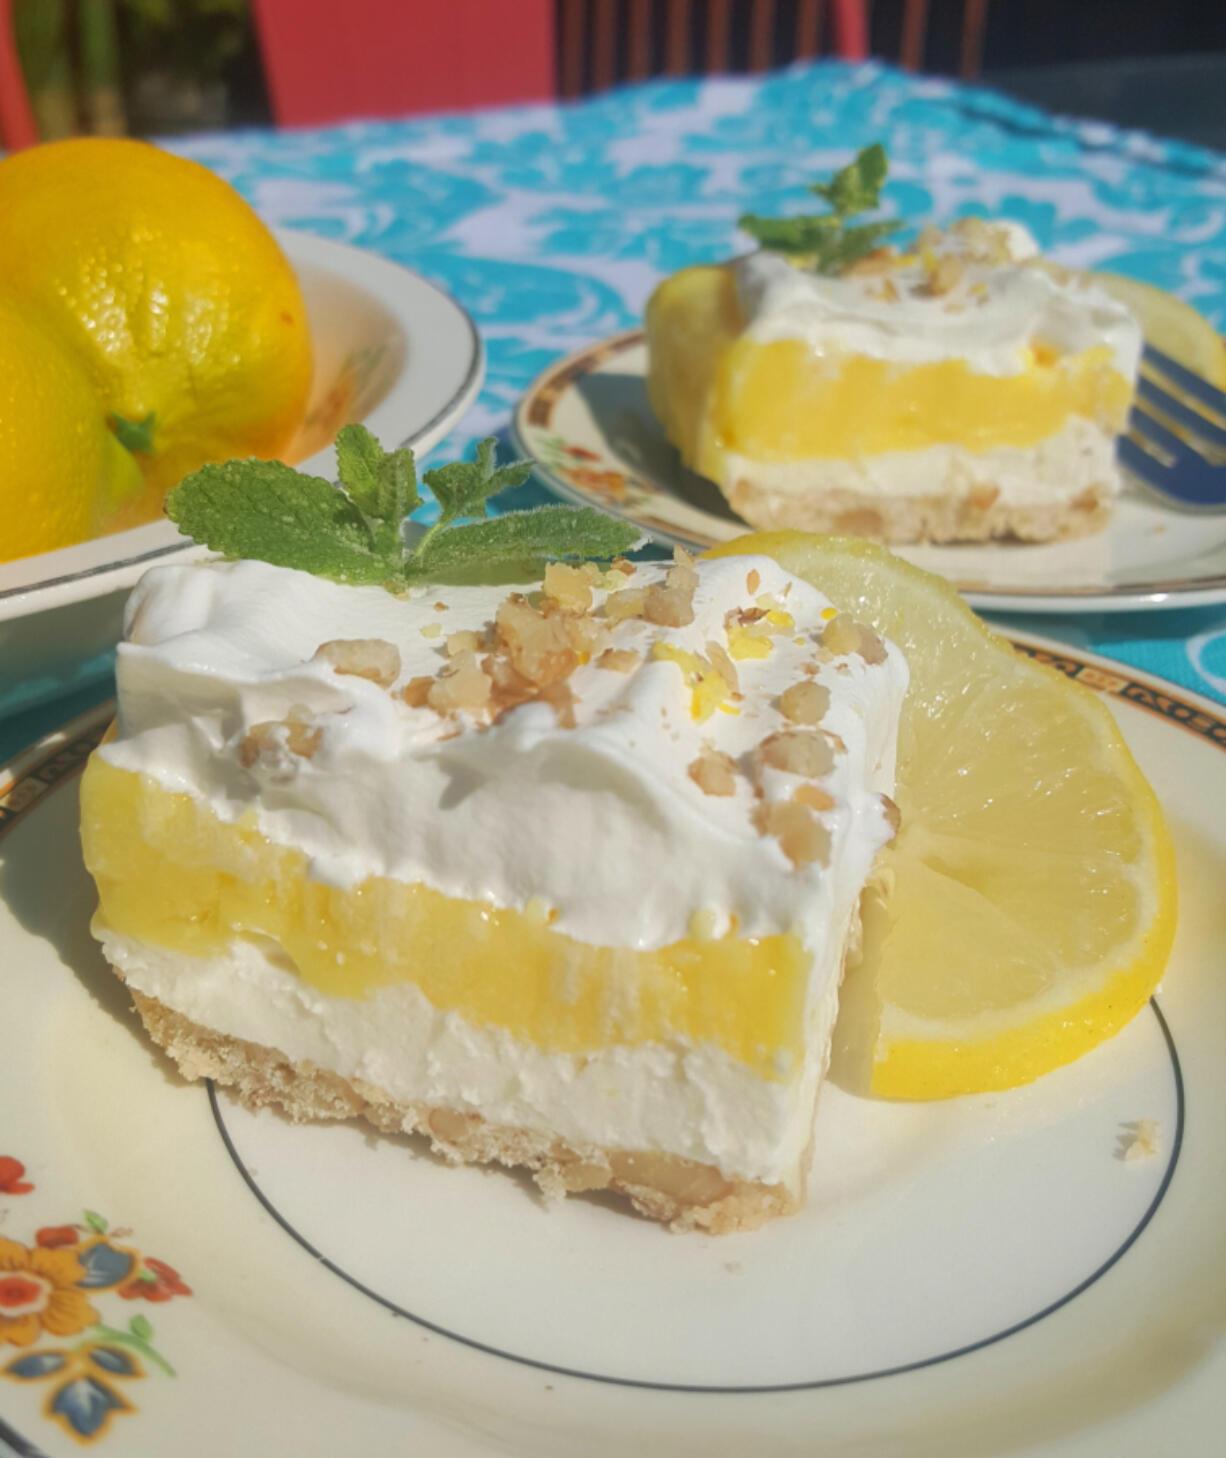 This citrusy, summery dessert is similar to lemon bars but uses lemon pudding in place of lemon curd.